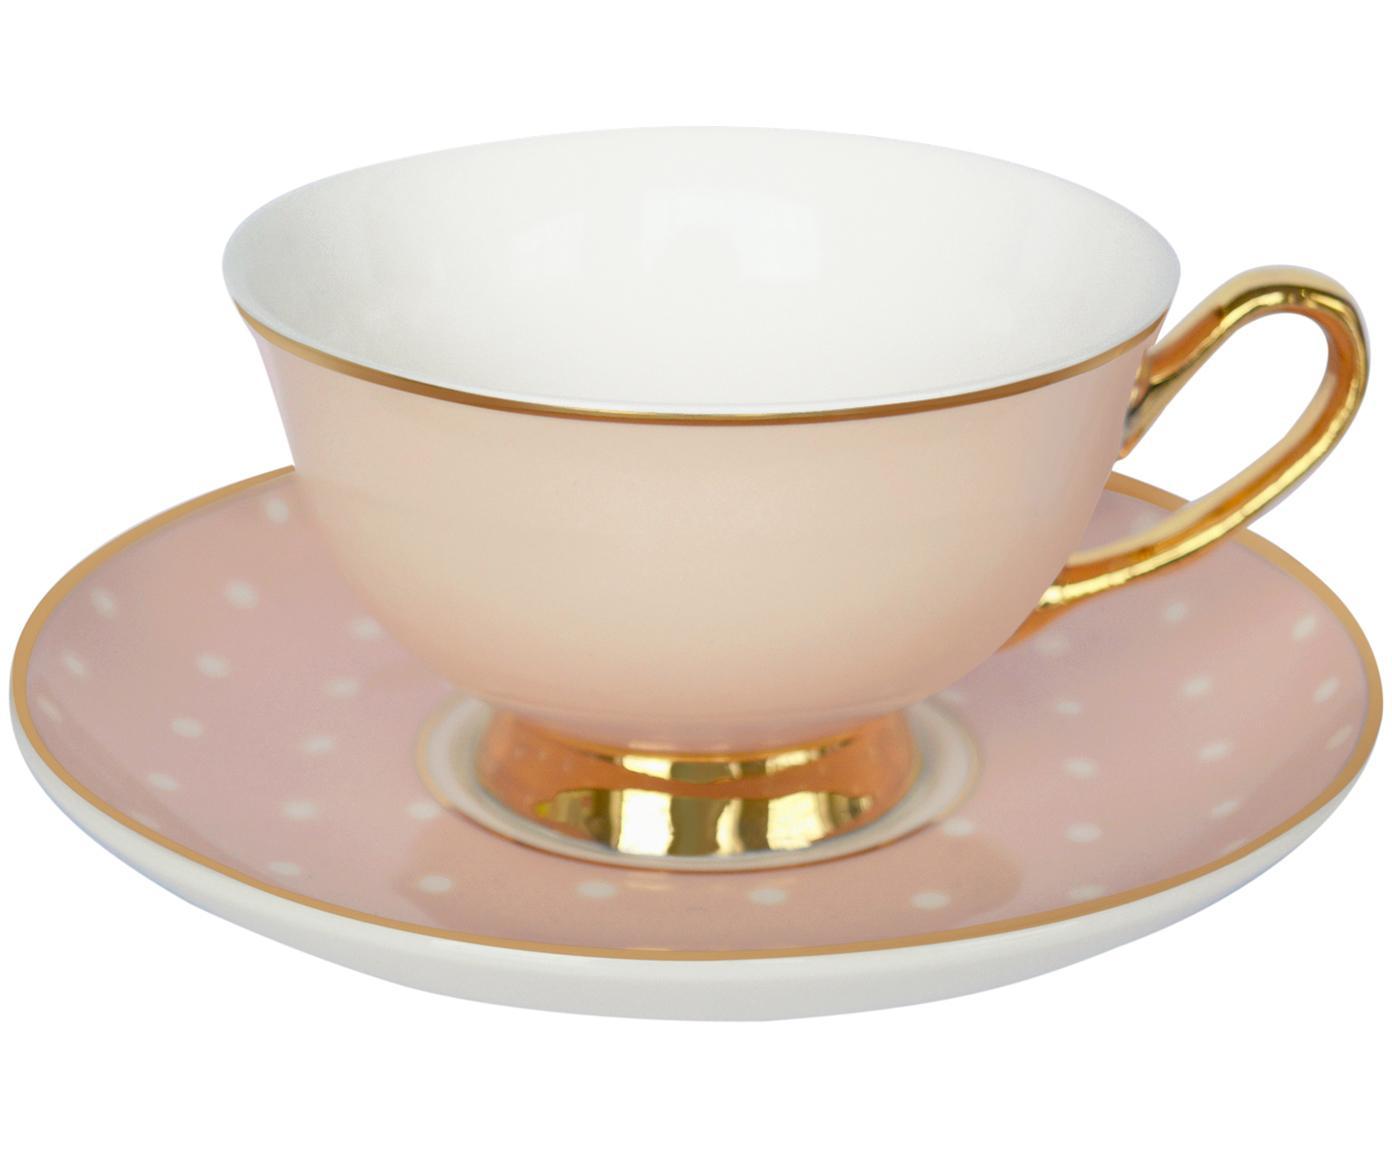 Tazza da tè Spotty, 2 pz., Porcellana cinese dorata, Rosa, bianco<br>Bordo e manico: dorato, Ø 15 x Alt. 6 cm